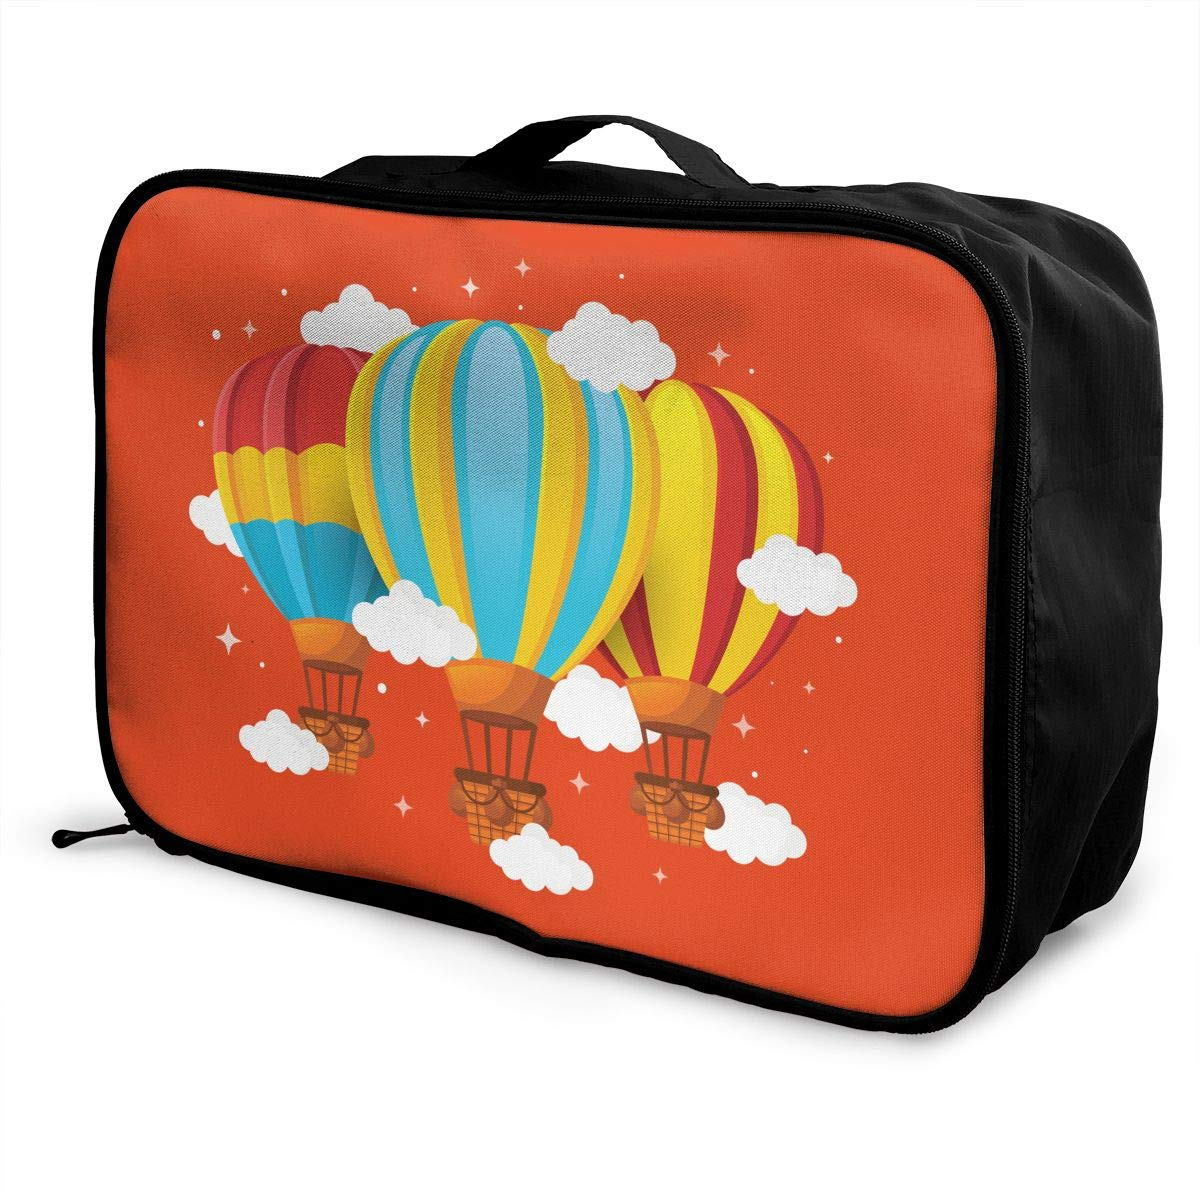 Travel Luggage Duffle Bag Lightweight Portable Handbag Hot Air Balloon Large Capacity Waterproof Foldable Storage Tote